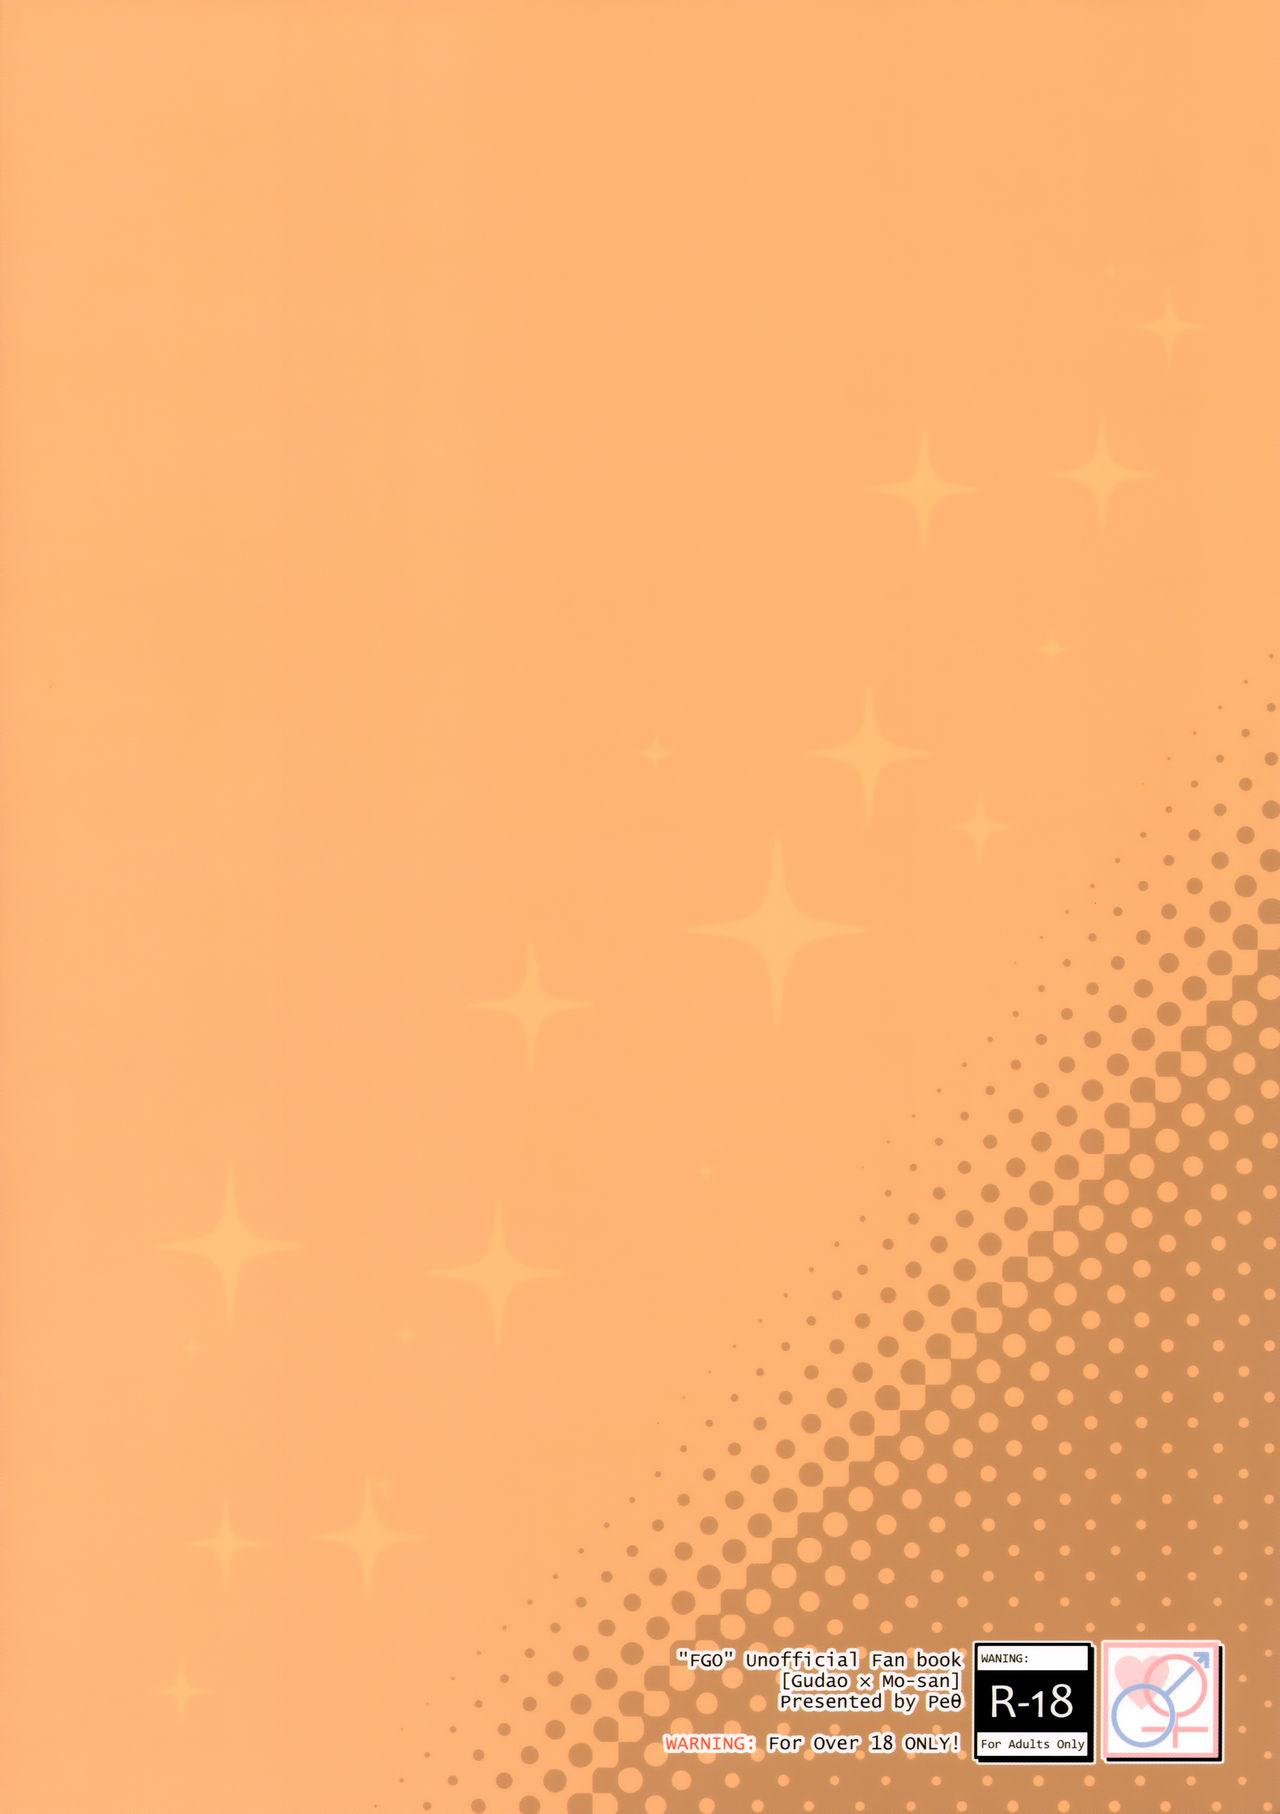 (COMIC1☆16) [Peθ (Mozu)] Full Dress Honey Knight -Kizuna10+ no Mor-san to Eirei Seisou- (Fate/Grand Order) [English] [EHCOVE] 21